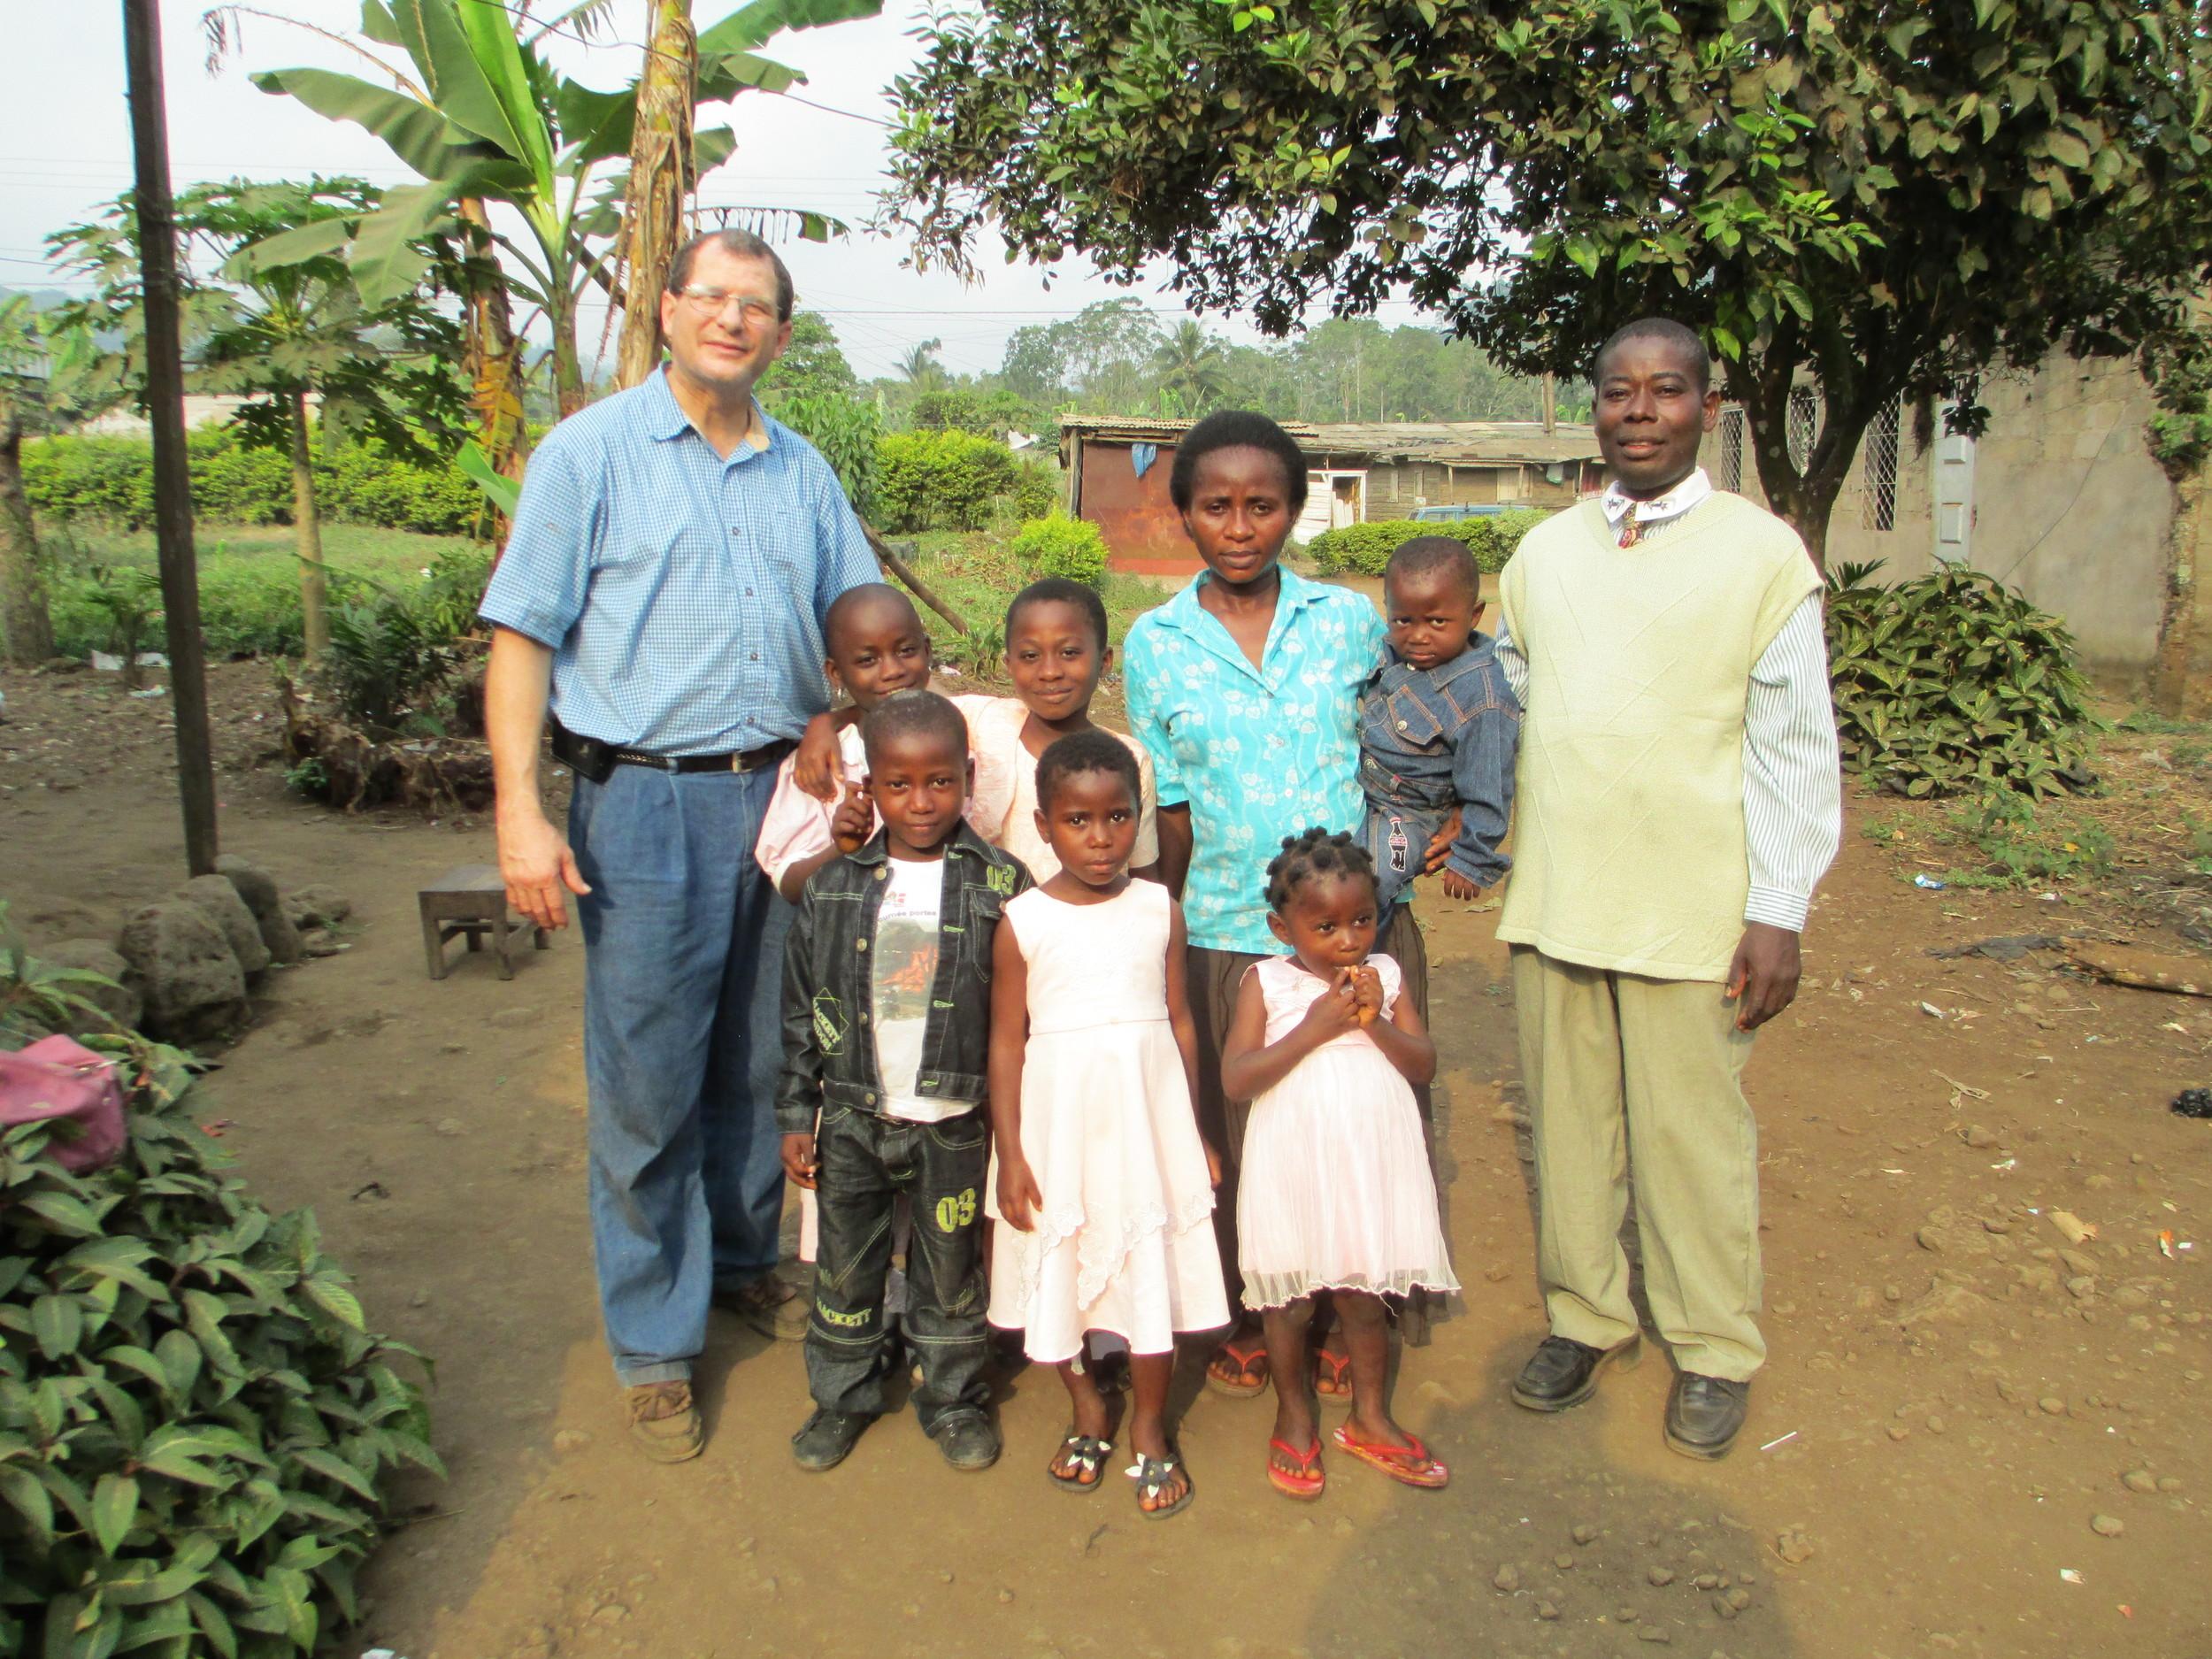 David, Harrison, Mary, and their children.JPG